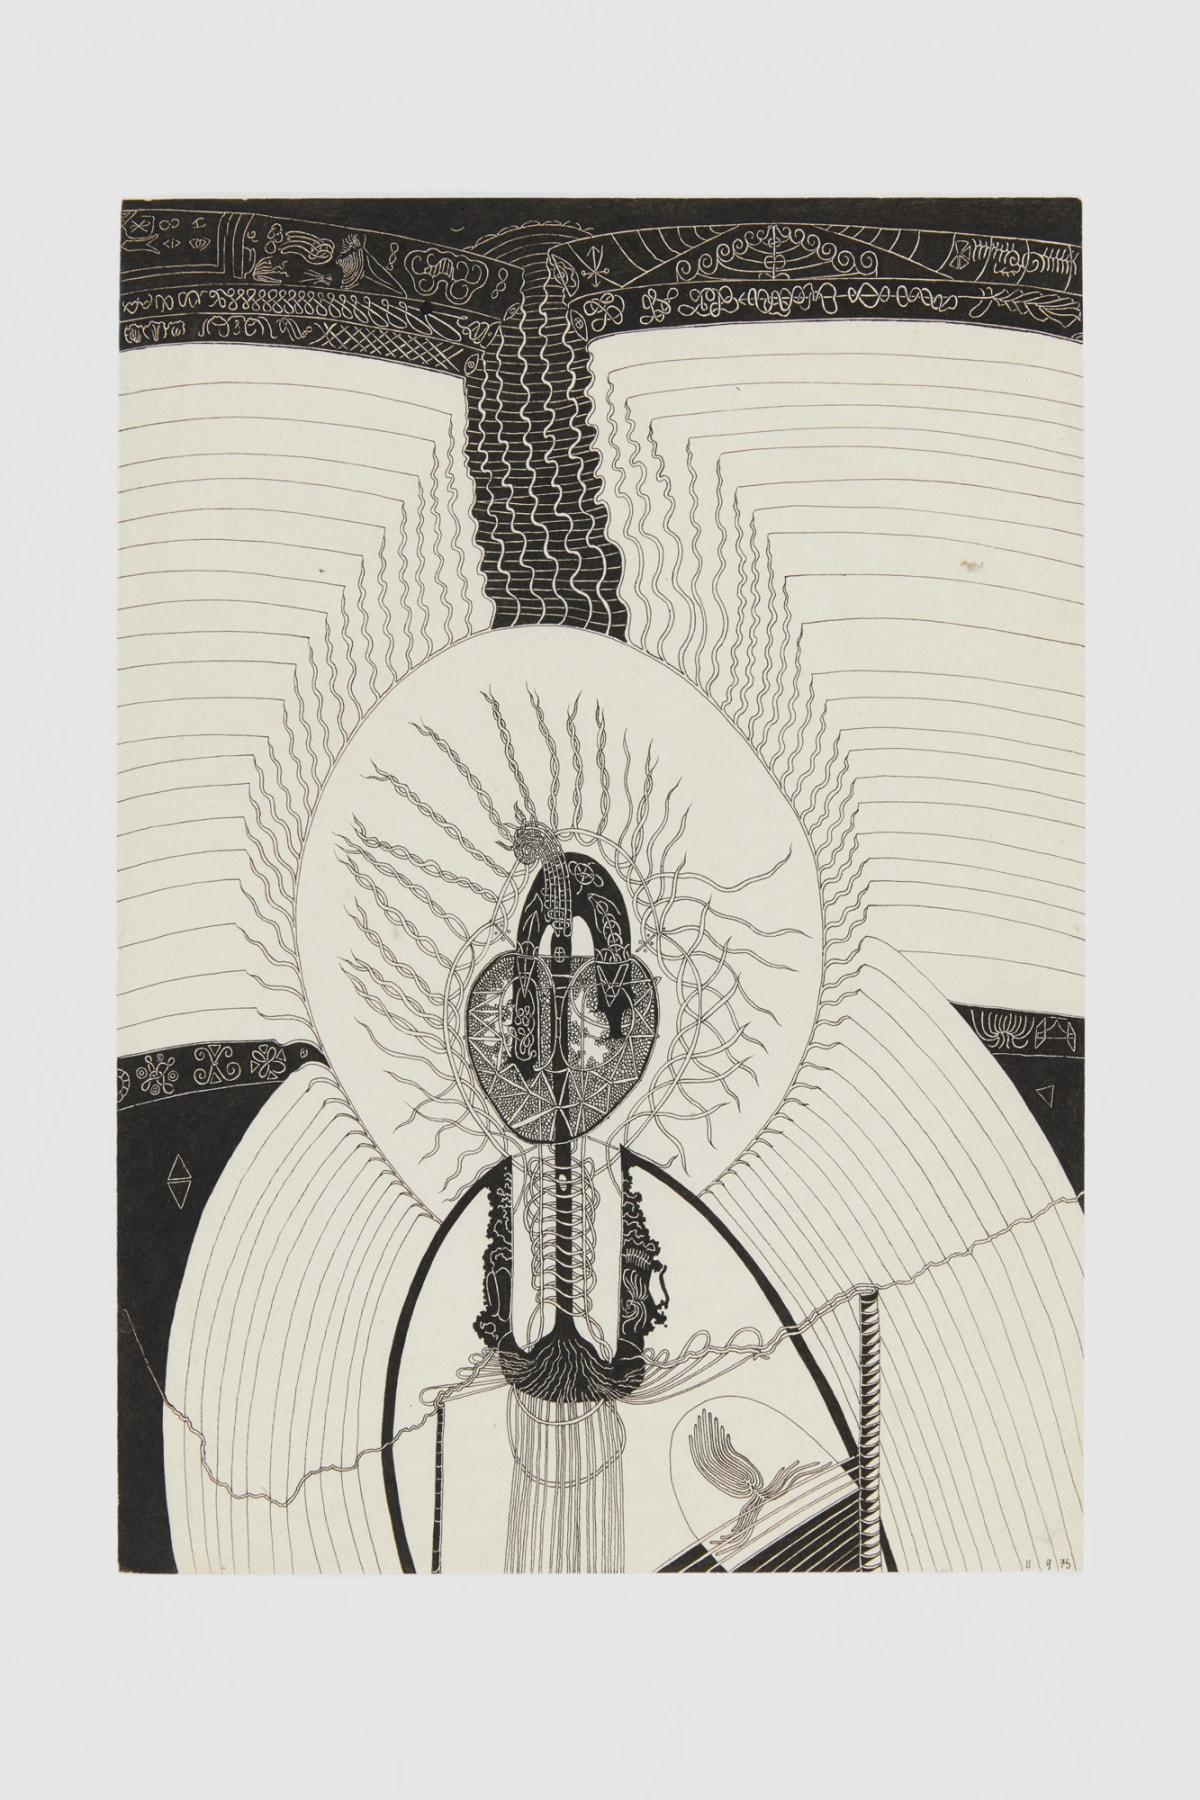 Ann CHURCHILL 11.9.75 (Daily drawings), 1975 Pen on paper 29.7 x 20.9 cm